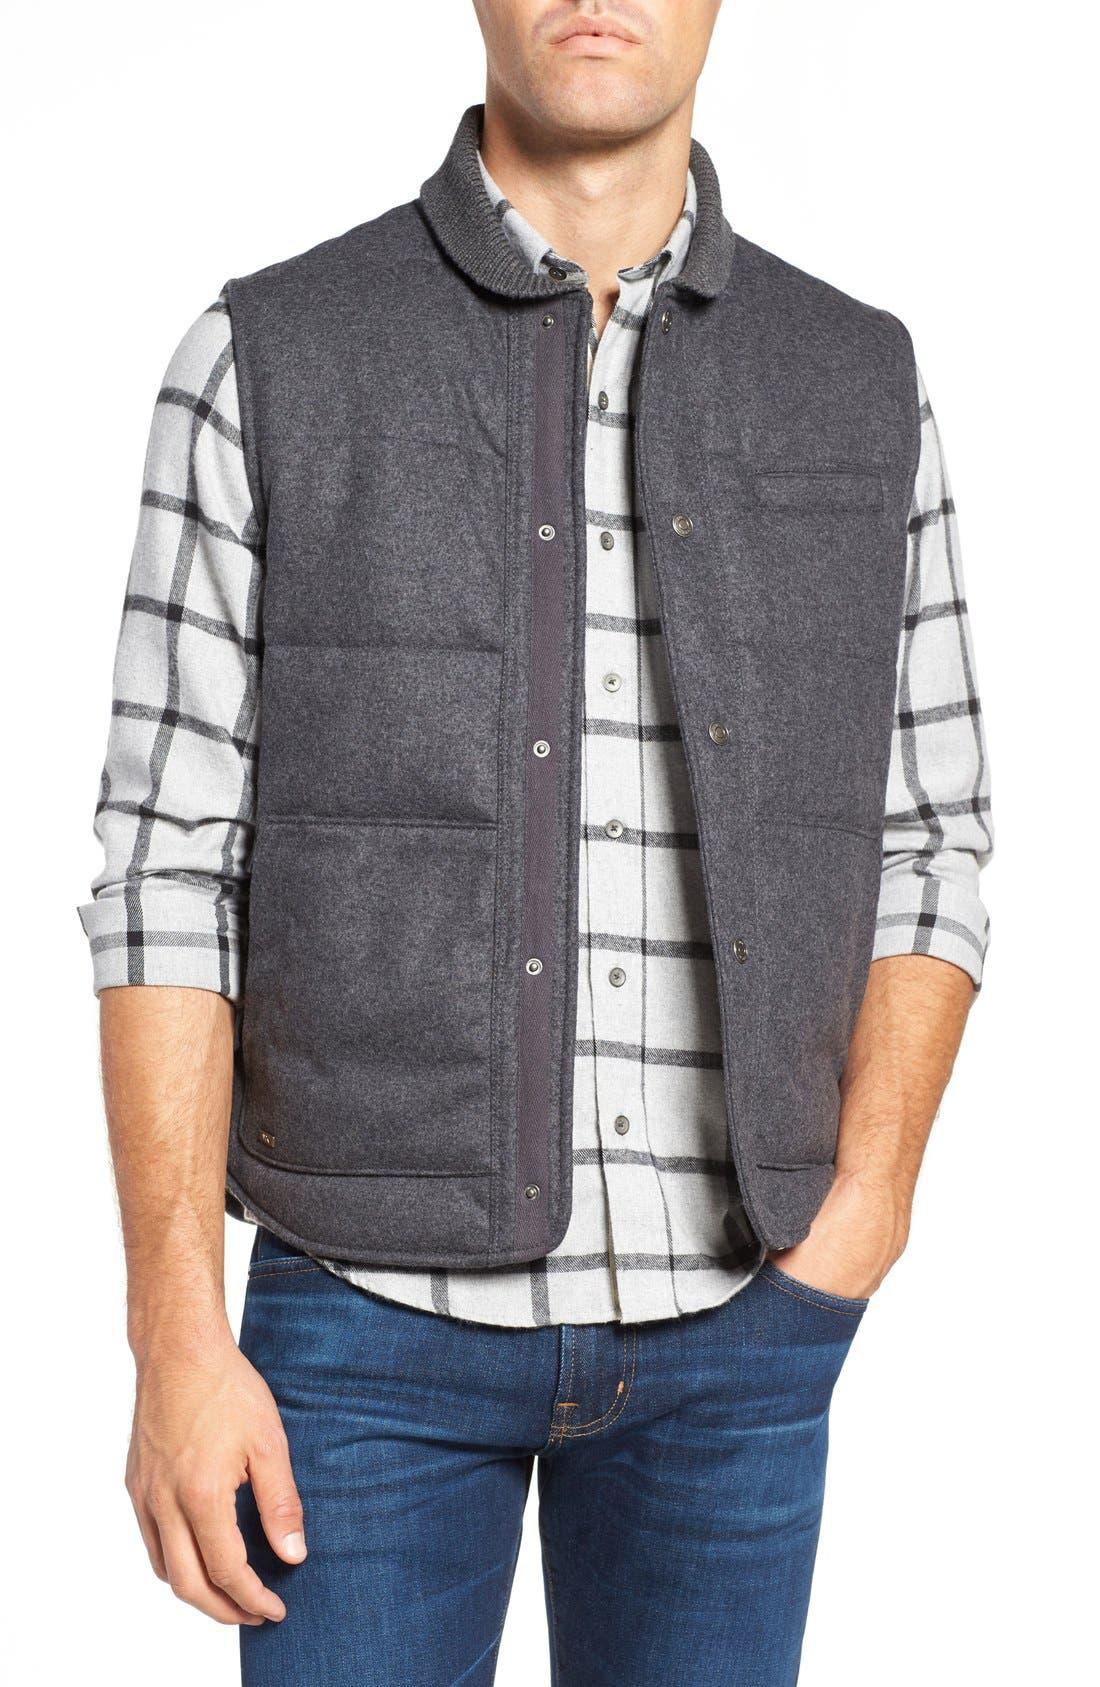 Pritchel Quilted Vest,                         Main,                         color, Charcoal